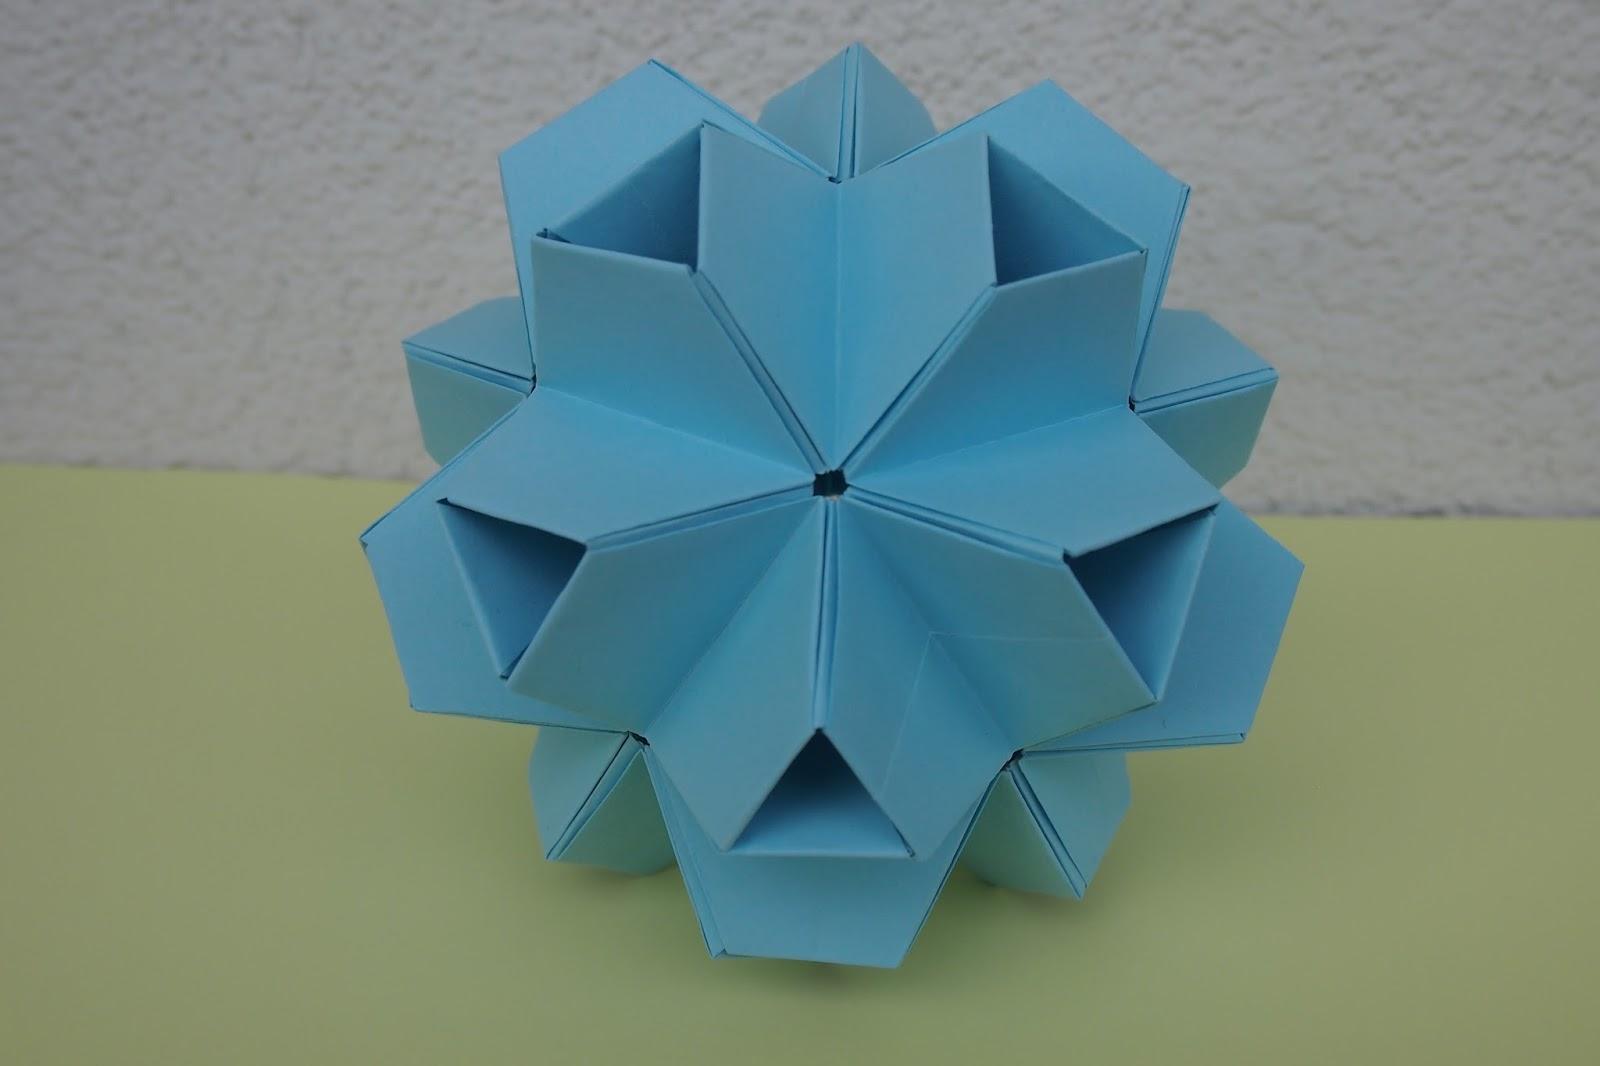 Wiat Z Kartki Papieru Lipca 2013 Tomoko Fuse Diagrams Diagram Znajduje Si W Ksice Multidimensional Transformations Unit Origami